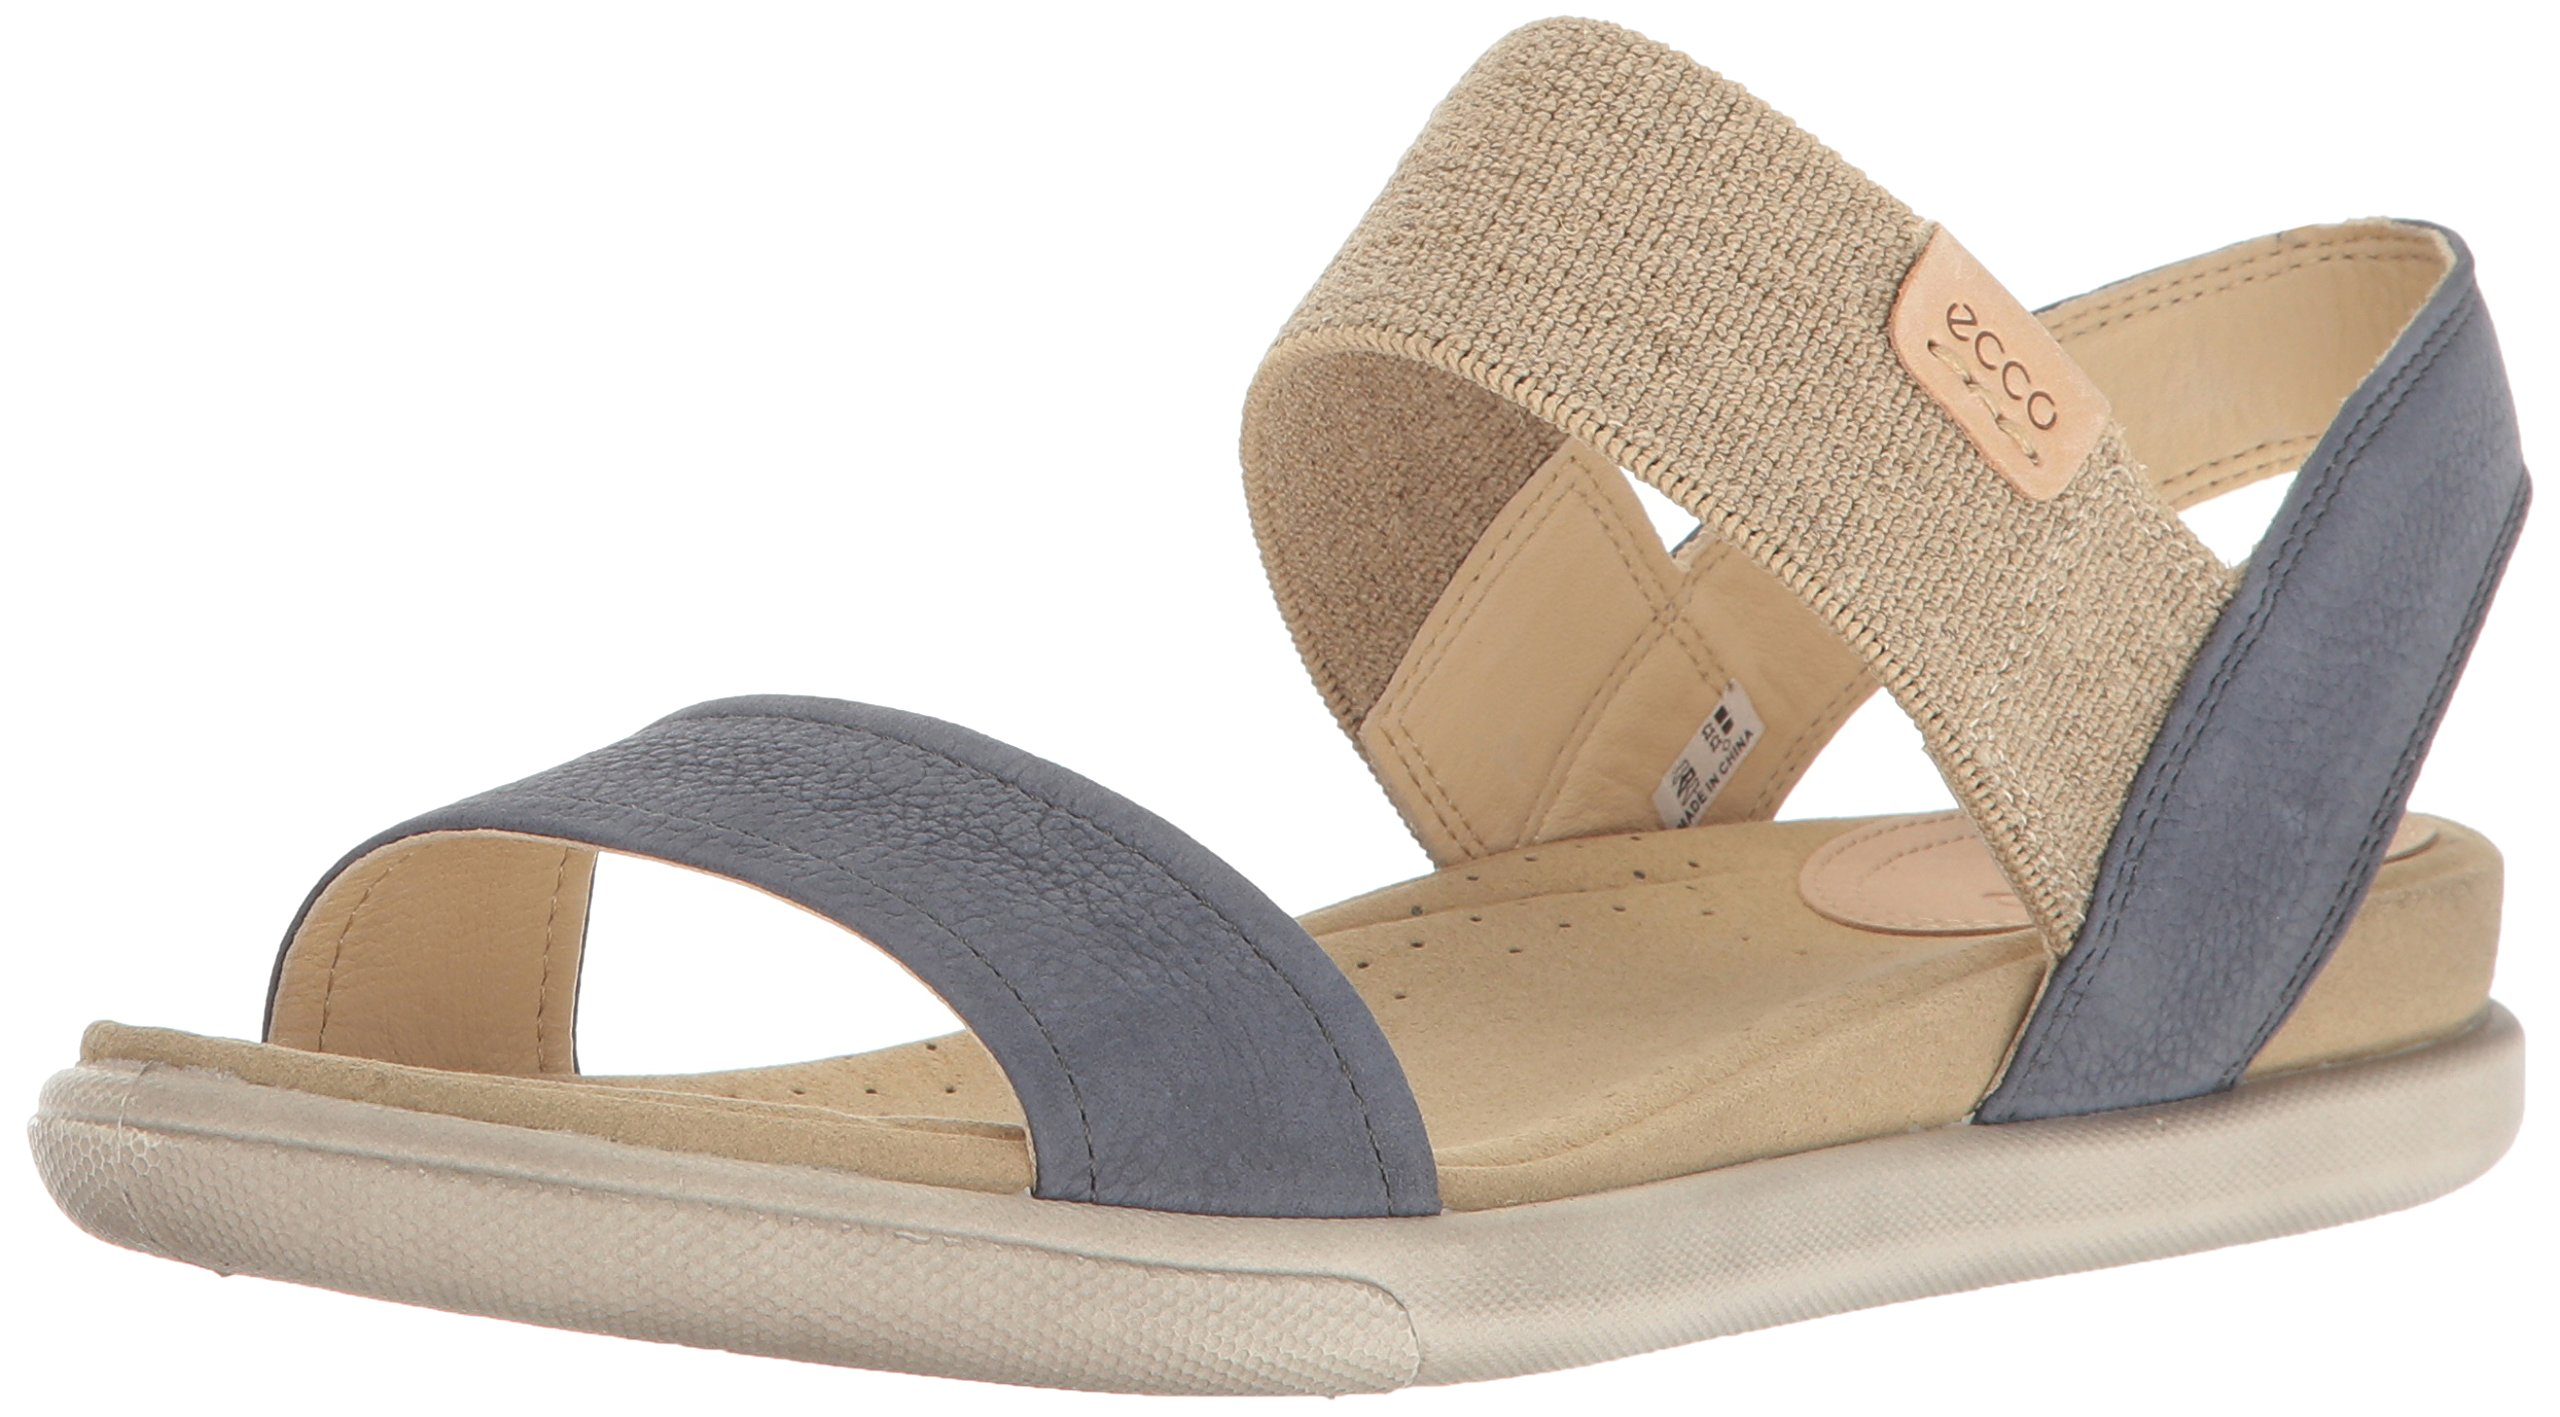 ECCO Women's Women's Damara Ankle Gladiator Sandal, Ombre/Powder, 38 EU/7-7.5 US